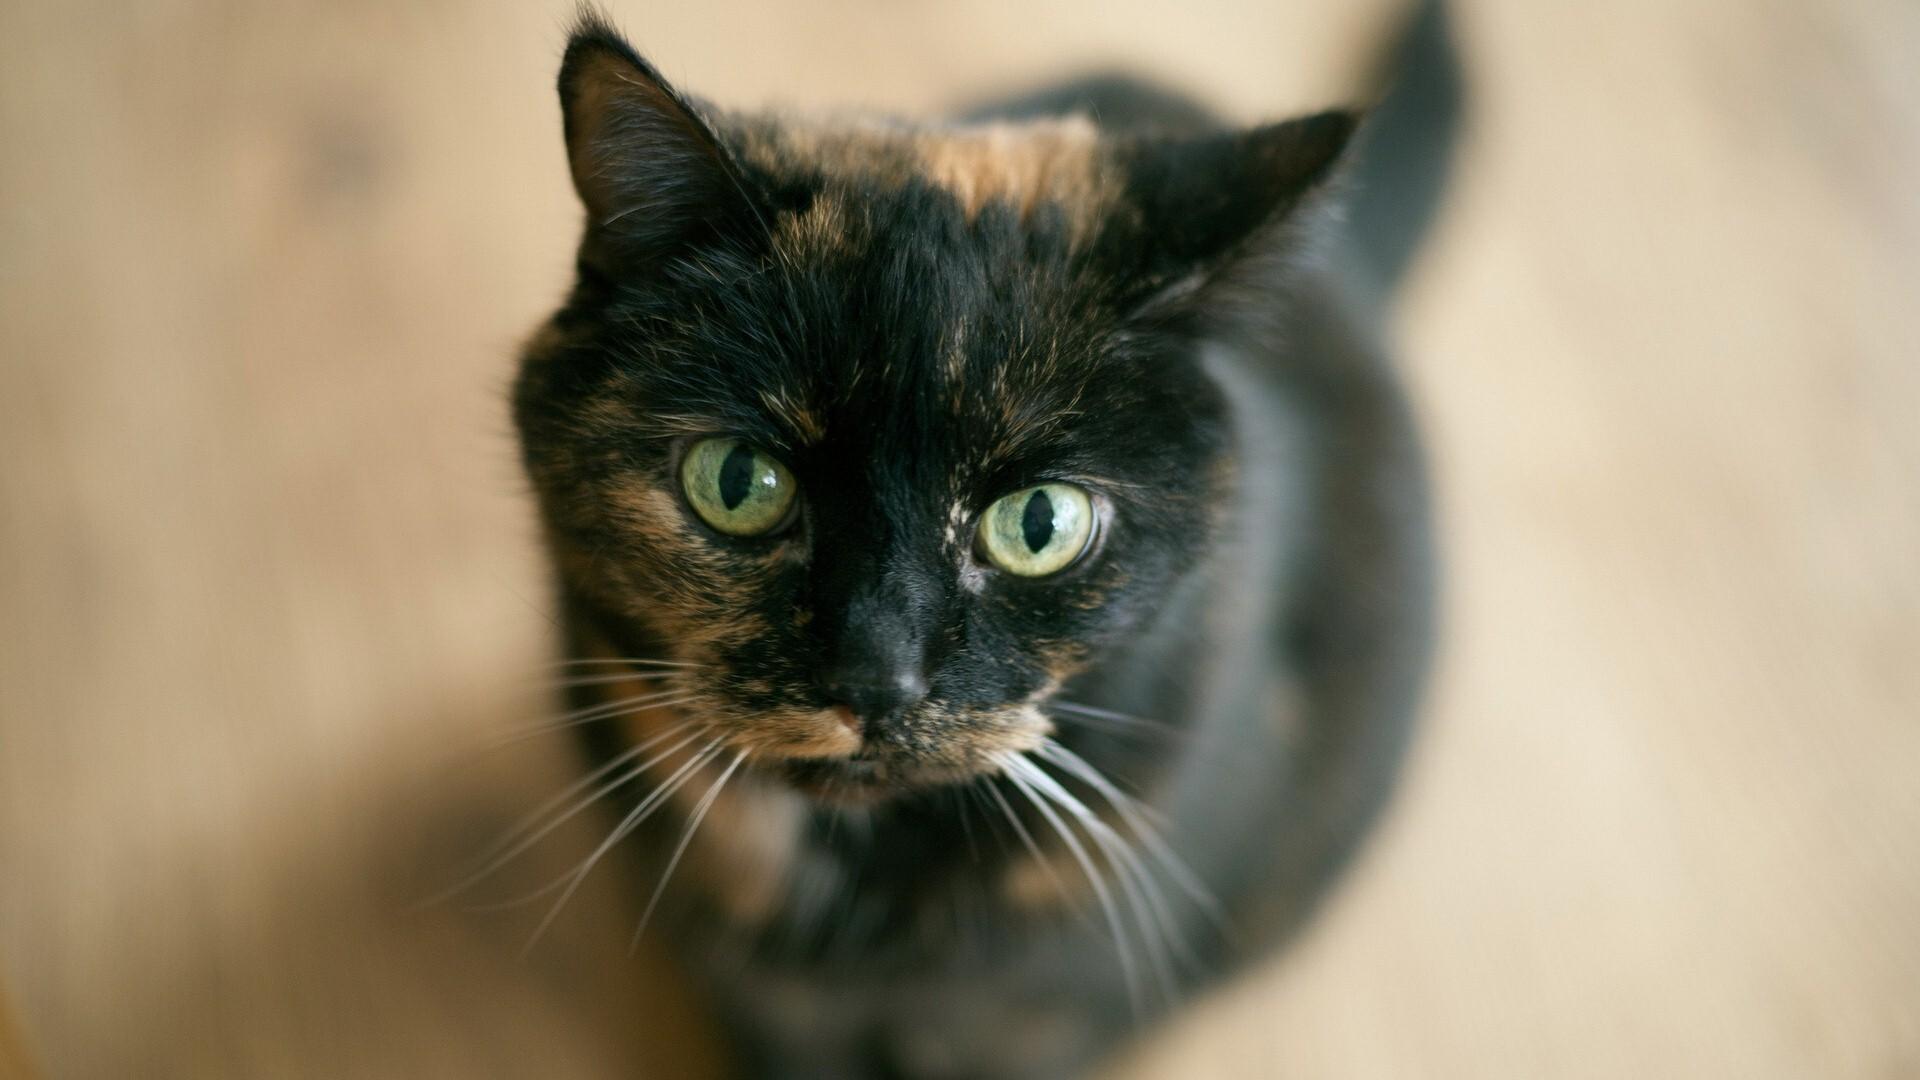 Black Cat Image Download